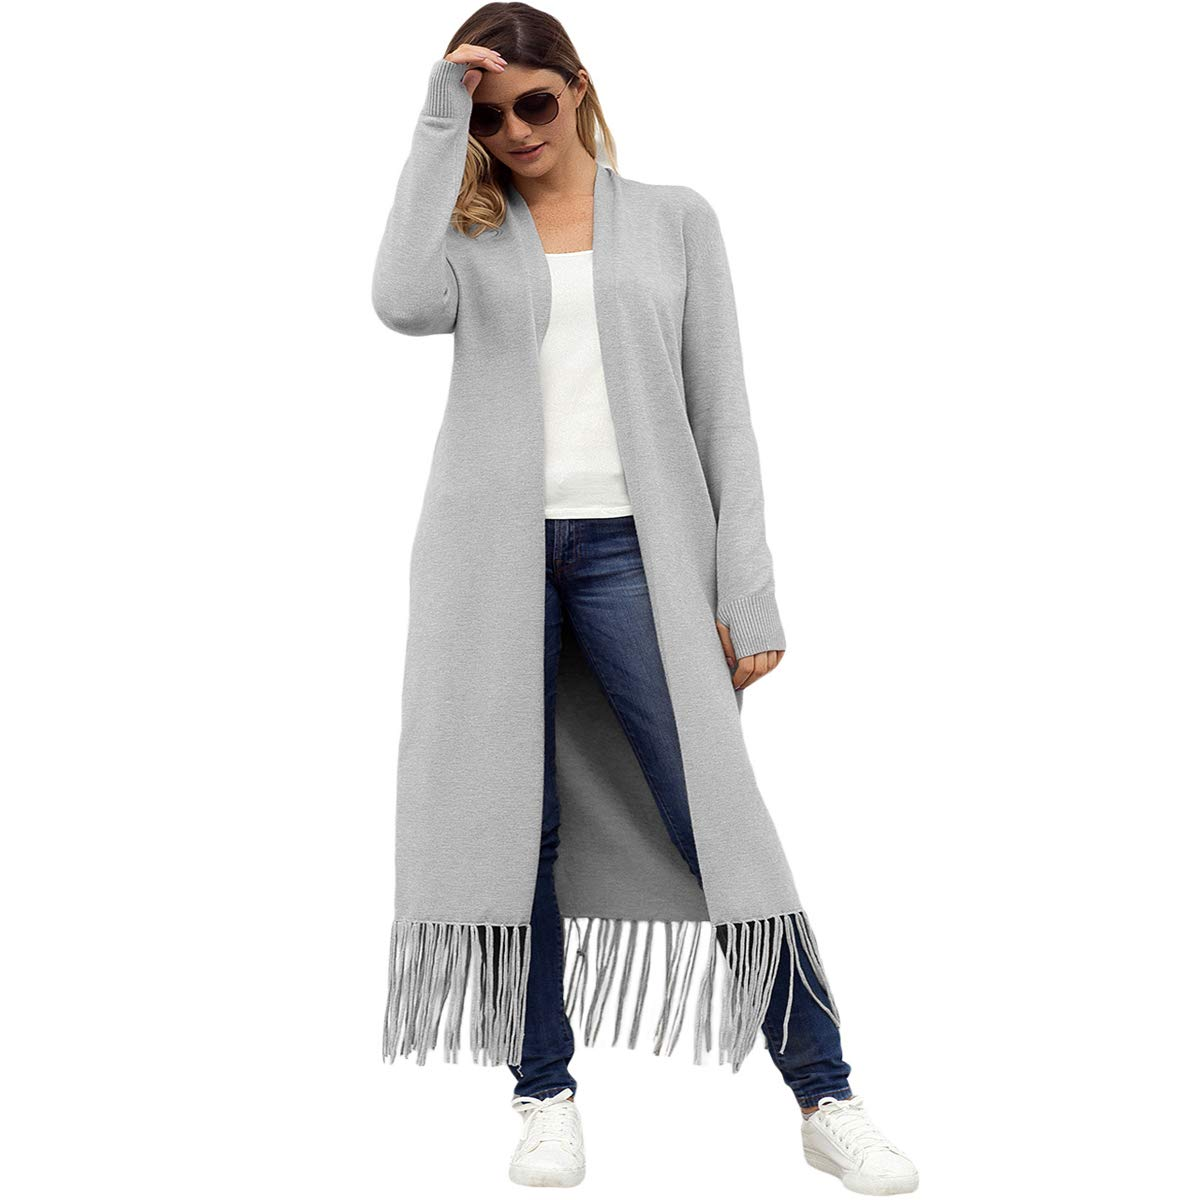 OMAMA Womens Open Front Knit Long Maxi Cardigan Sweater Solid Tassel Plus Size Long Sleeve Coat Outwear